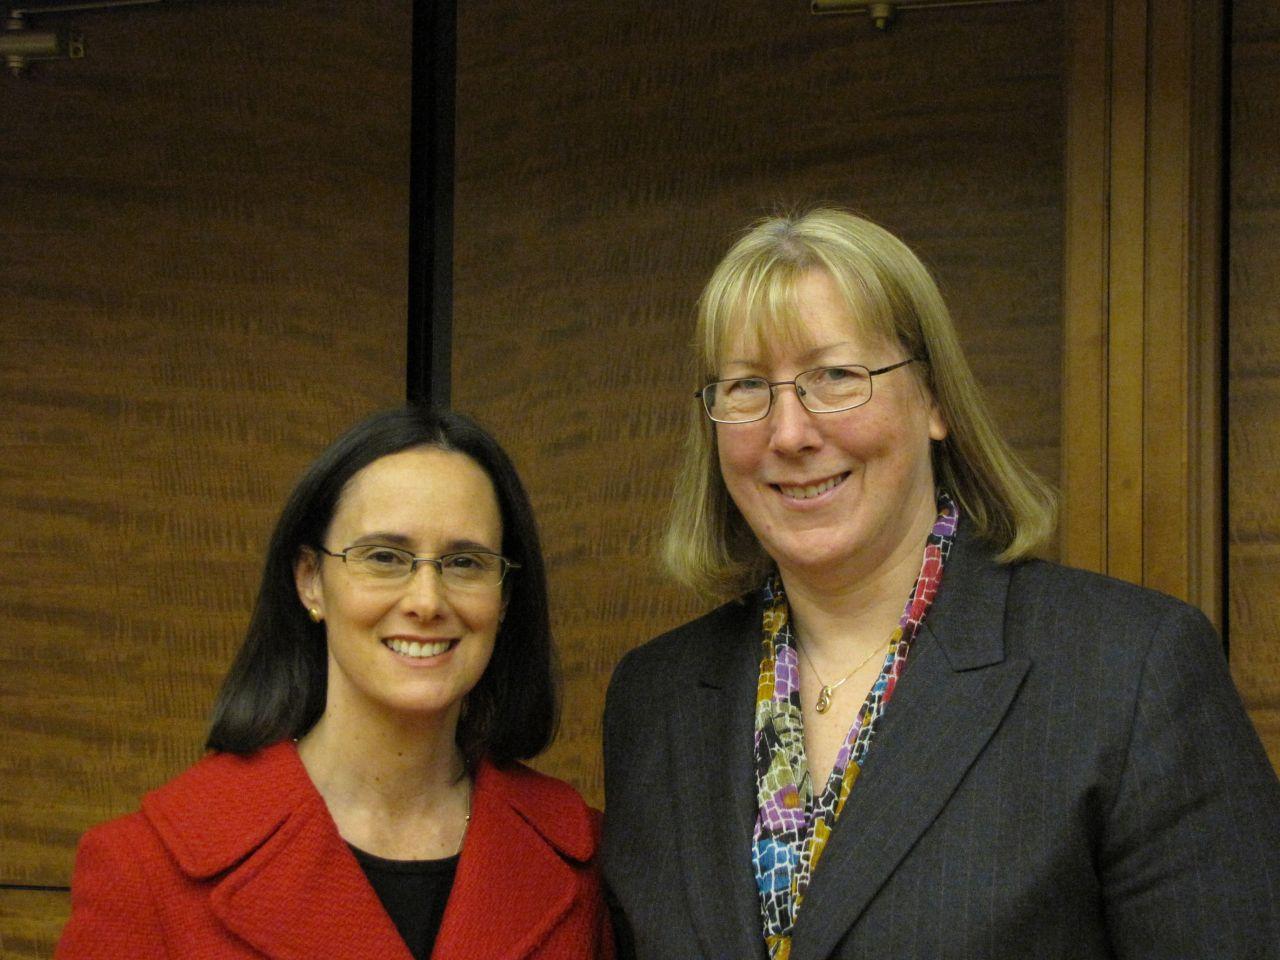 Attorney General Madigan with SIU Law School Professor Alice Noble-Allgire